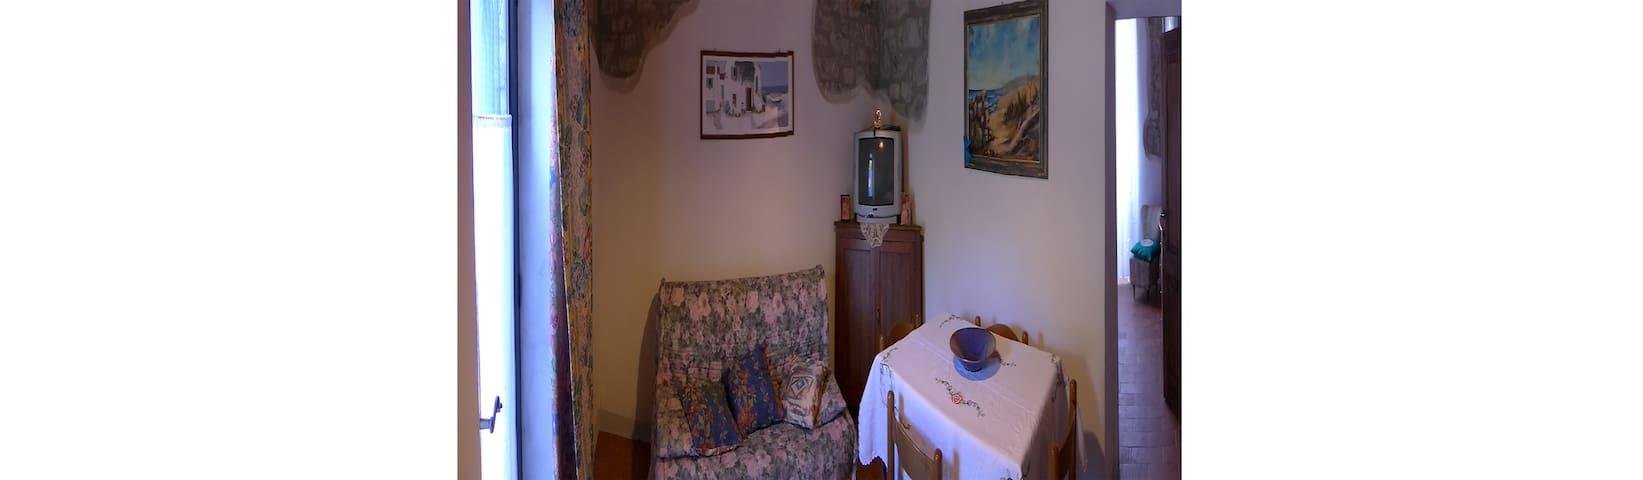 Bilocale in Toscana vicino alle Terme di Saturnia